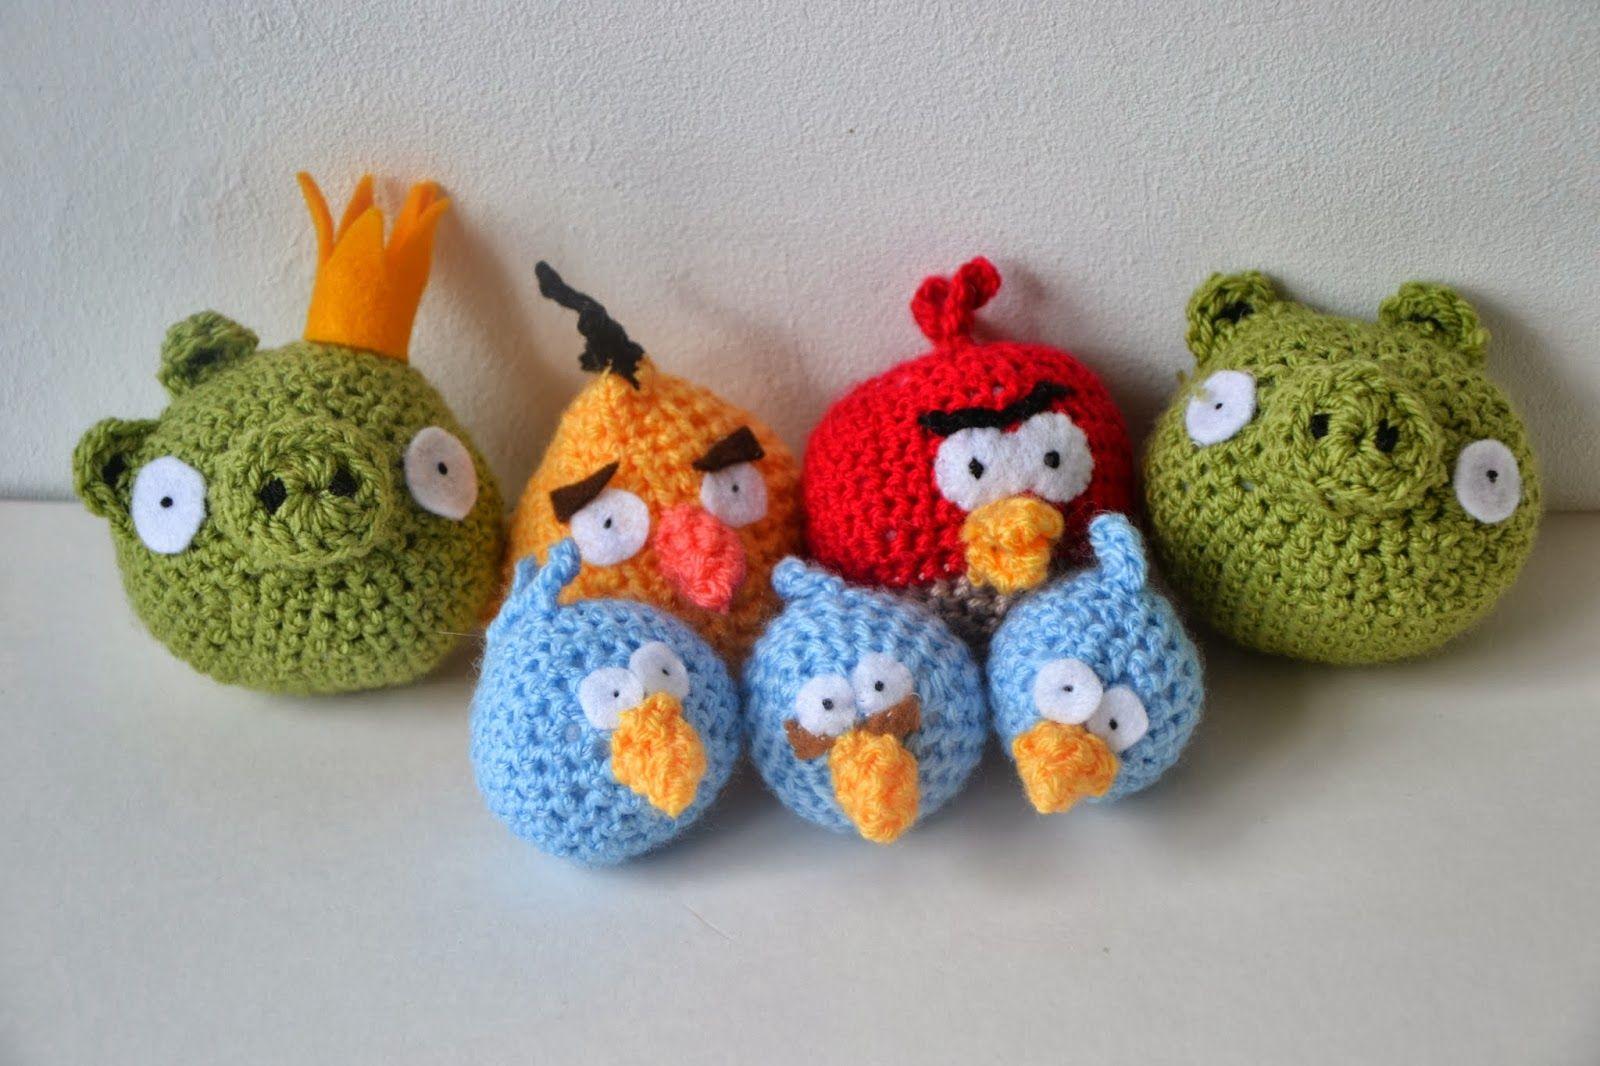 Tutorial Amigurumi Angry Bird : Angry birds amigurumi bomb bird plushie angery birds amigurumi